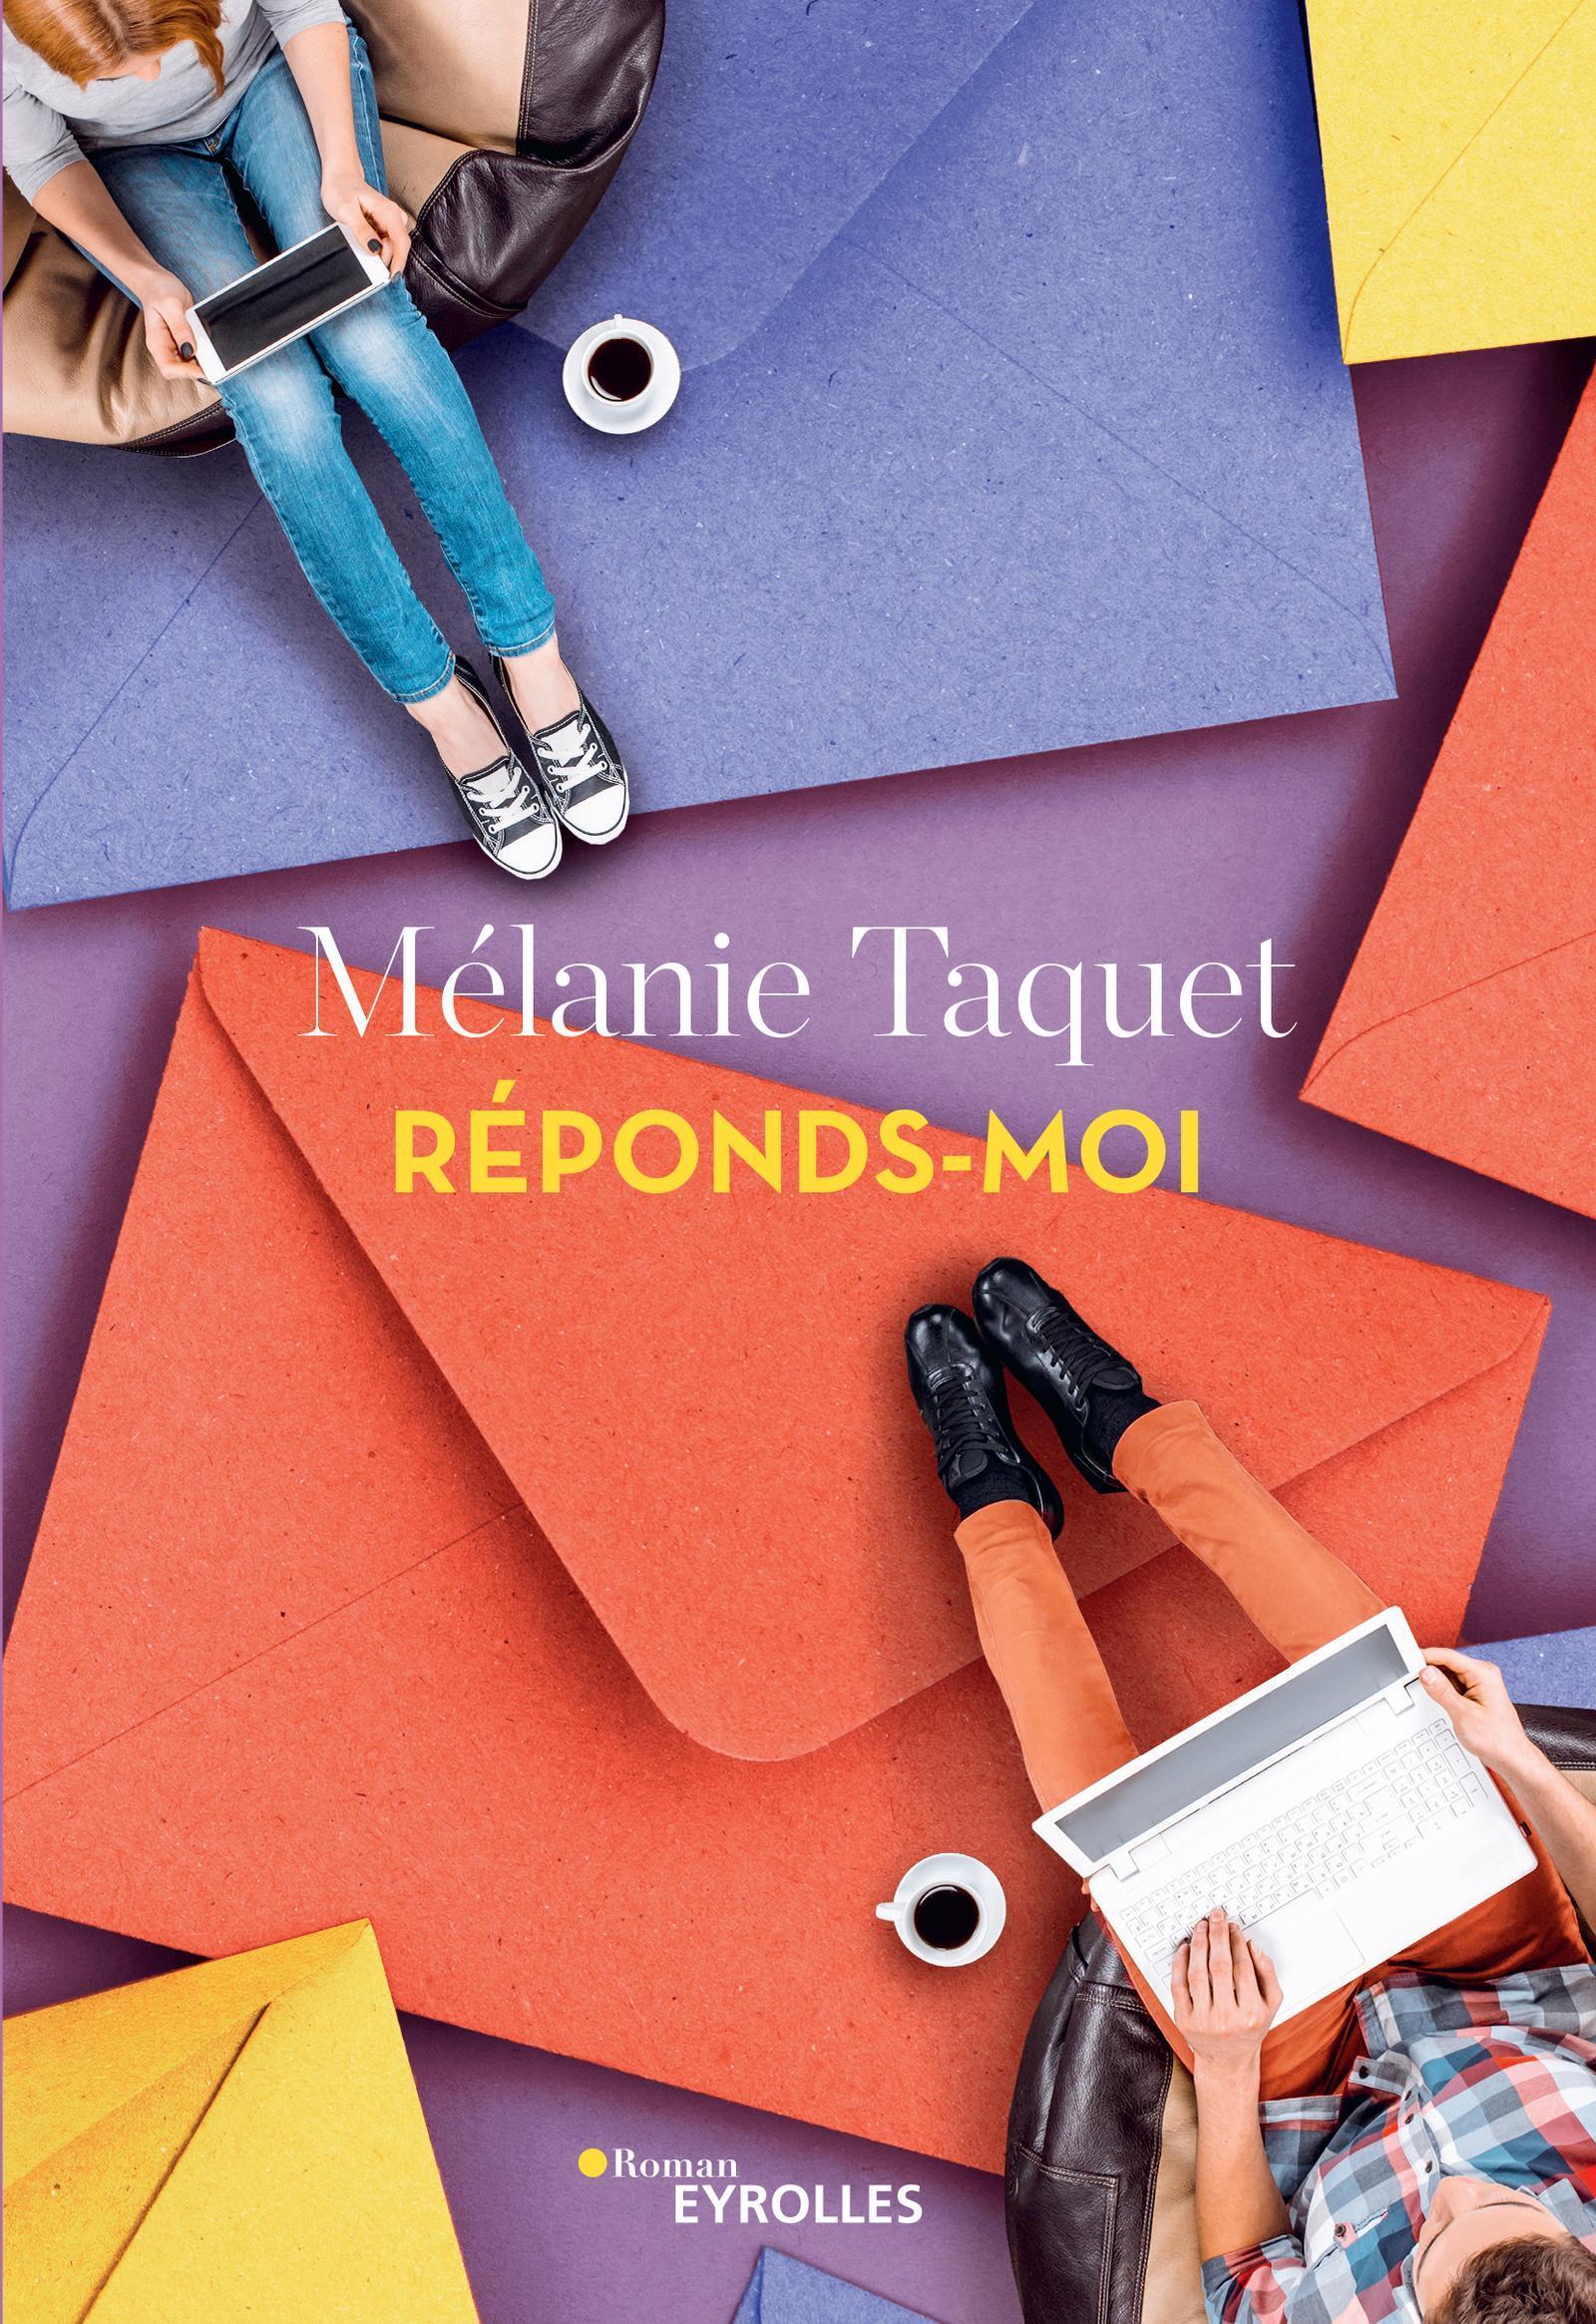 REPONDS-MOI